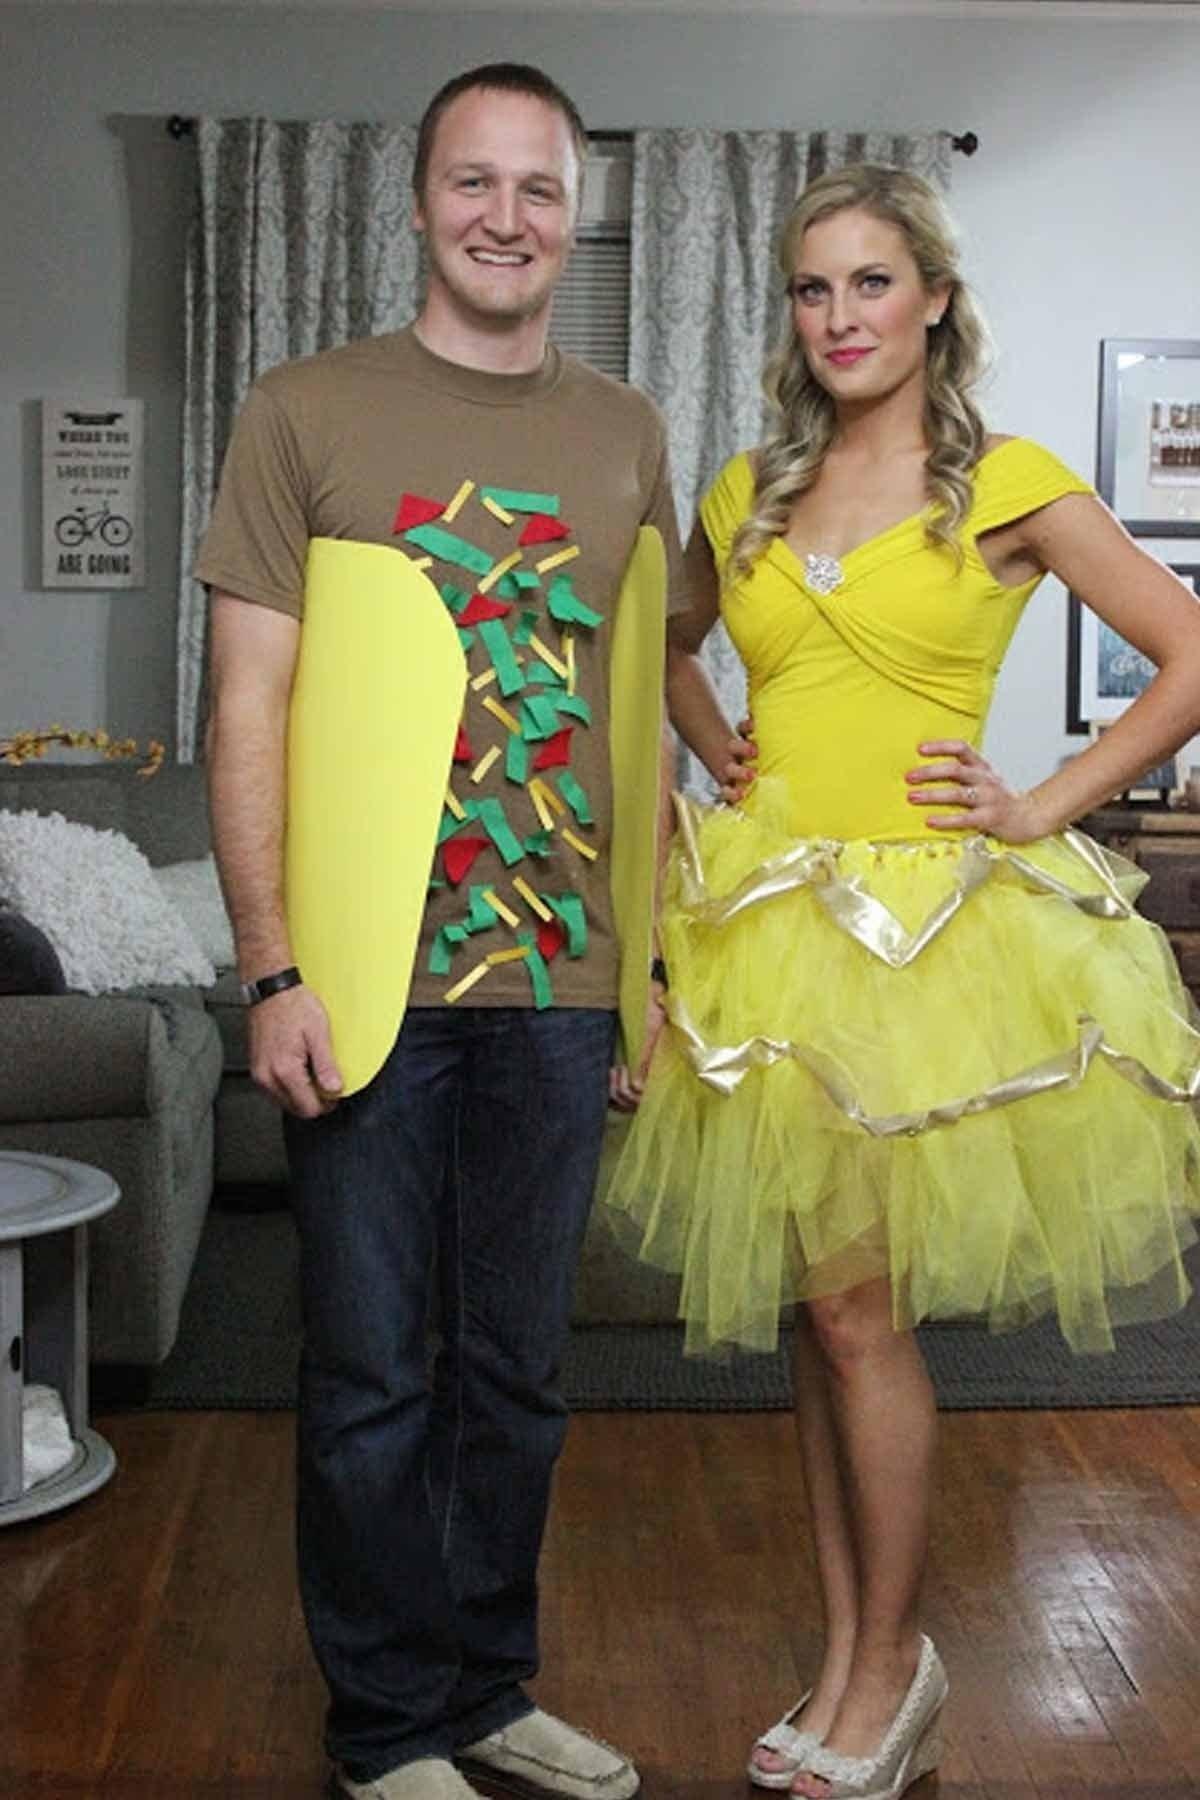 10 Nice Best Couple Halloween Costume Ideas 50 cute couples halloween costumes 2017 best ideas for duo costumes 2020